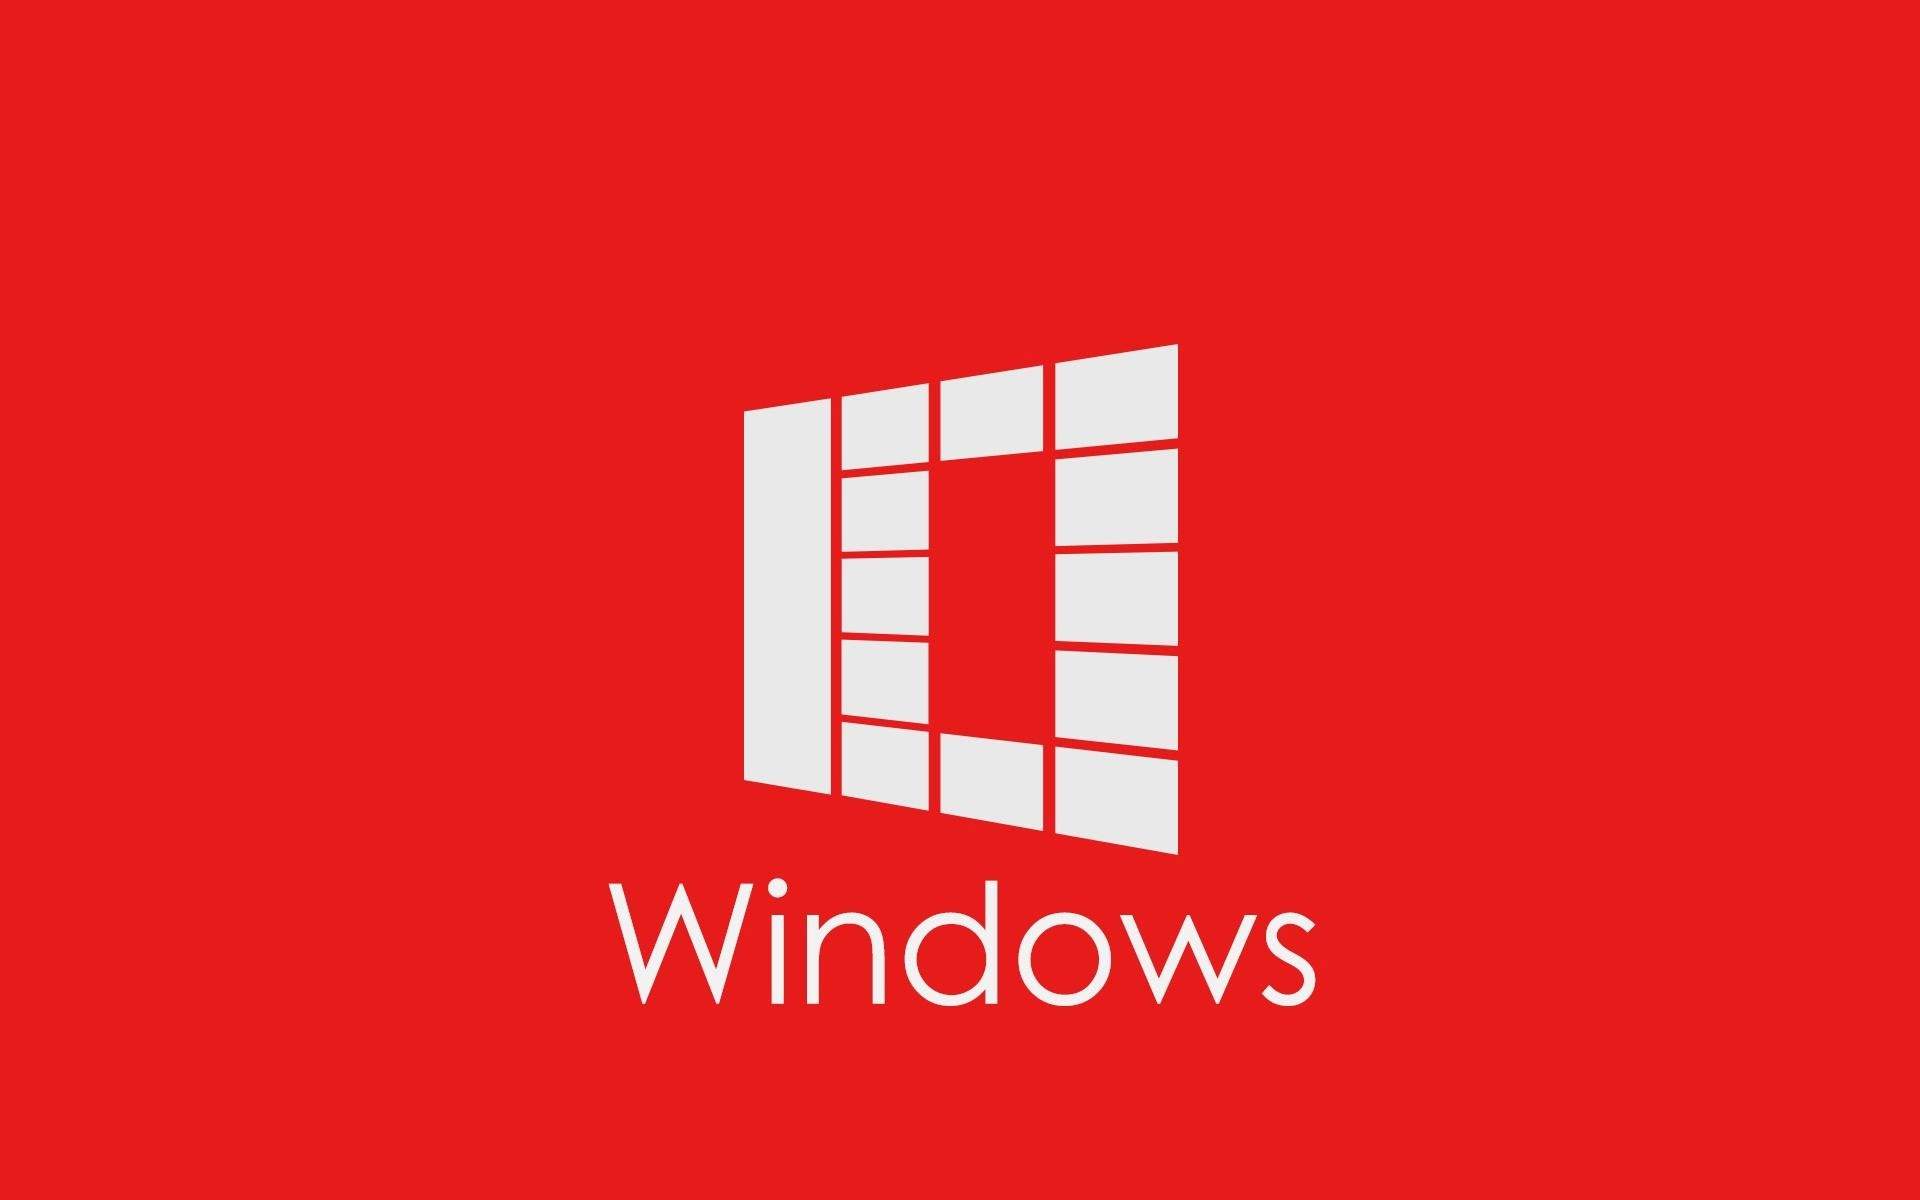 Windows-Wallpaper-for-Desktop